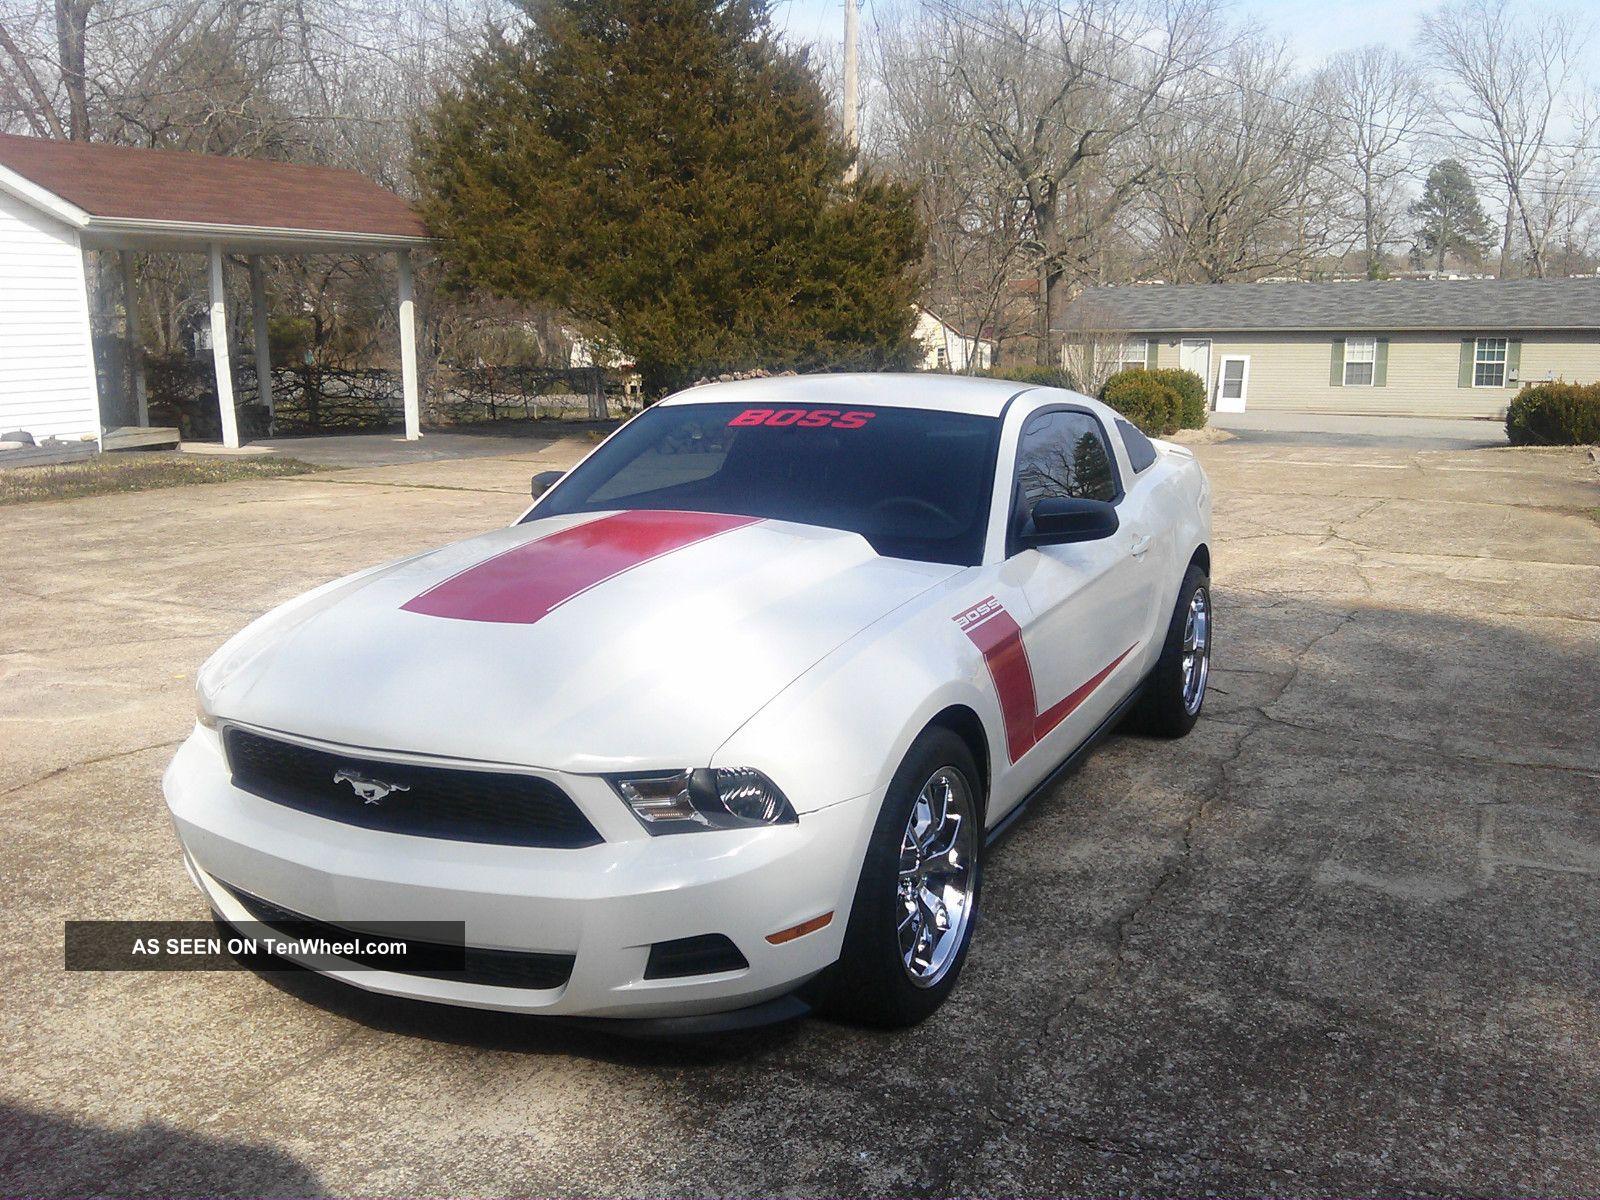 2011 Ford Mustang Boss Mustang photo